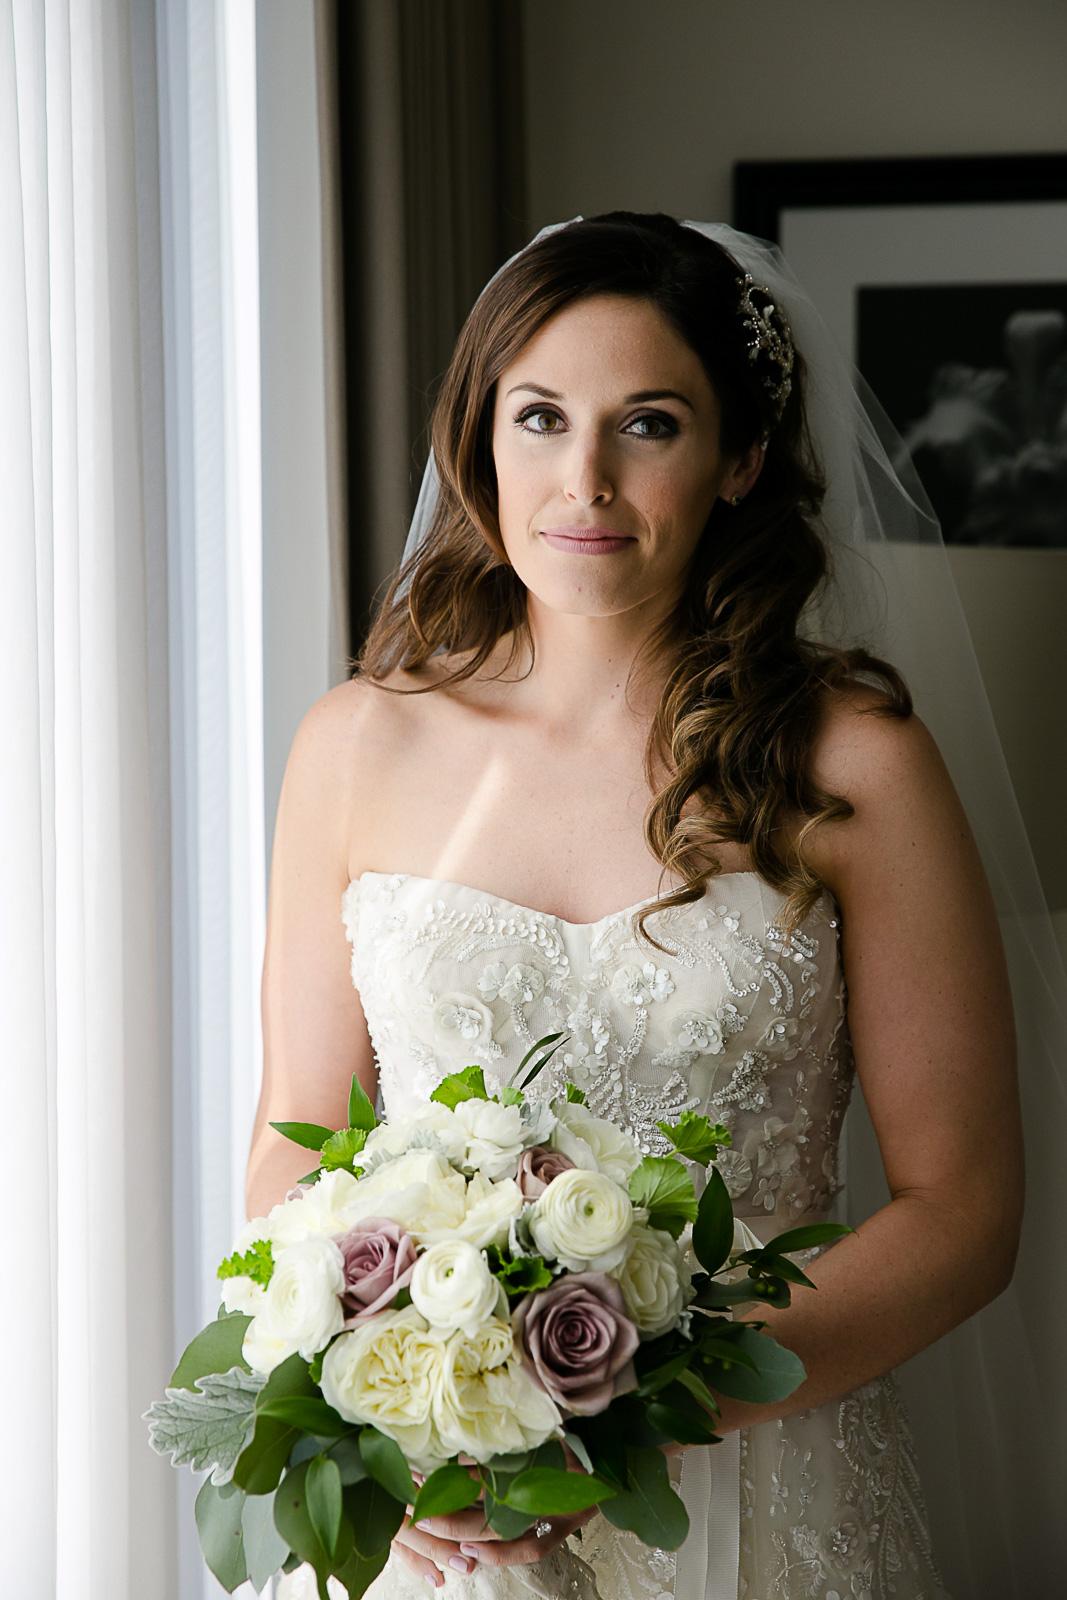 Vertical-oriented bridal portrait at the Langham's bridal suite in Chicago.